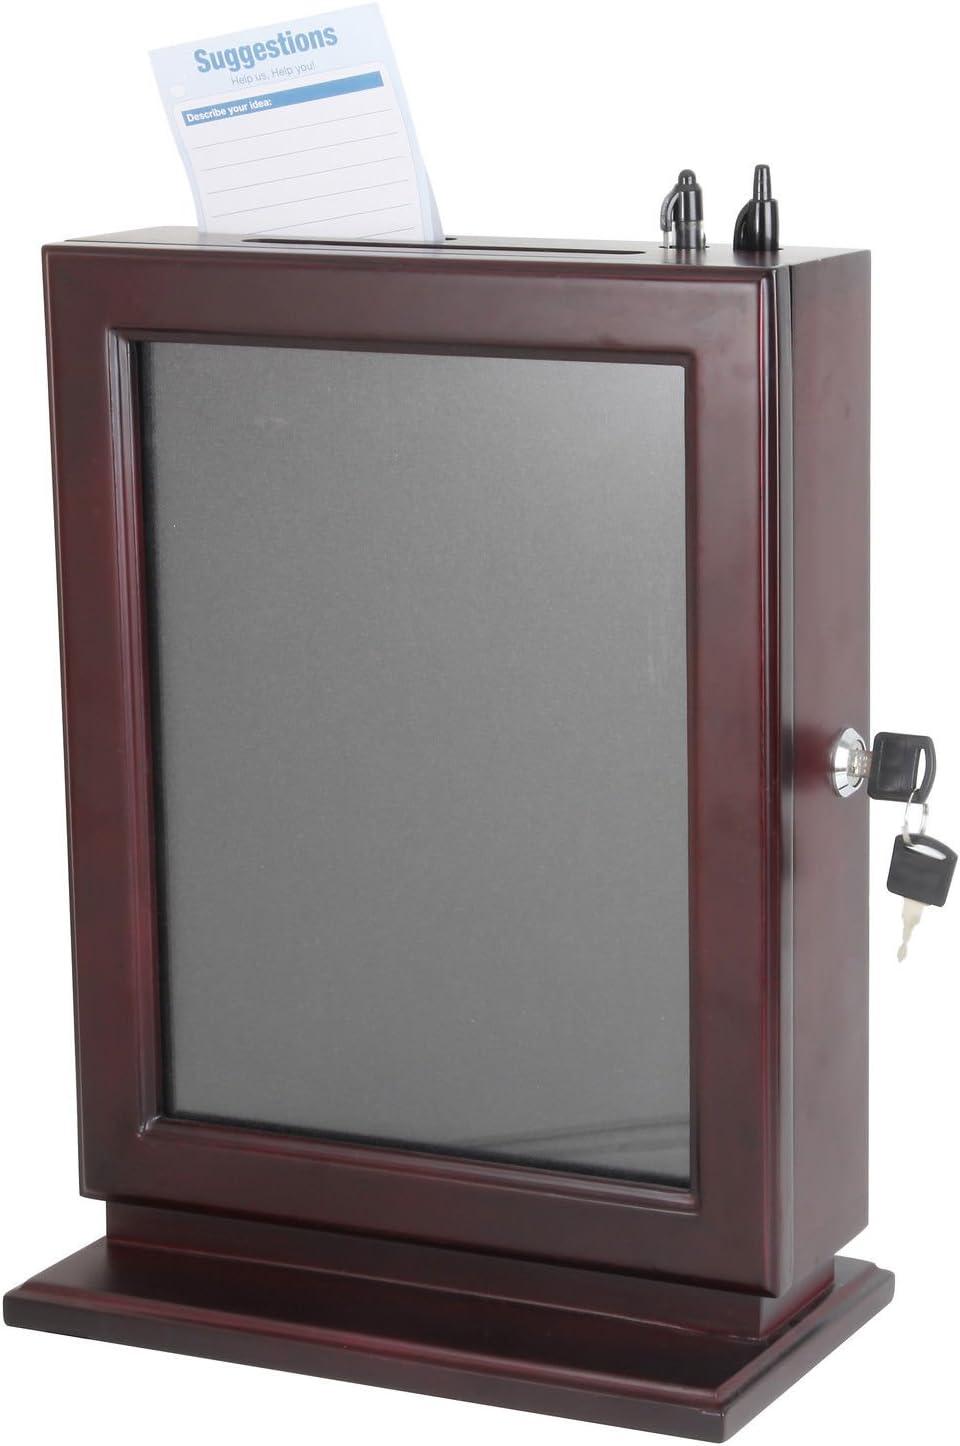 Phoenix Mall FixtureDisplays Max 43% OFF Wood Collection Box Suggestion Char Donation